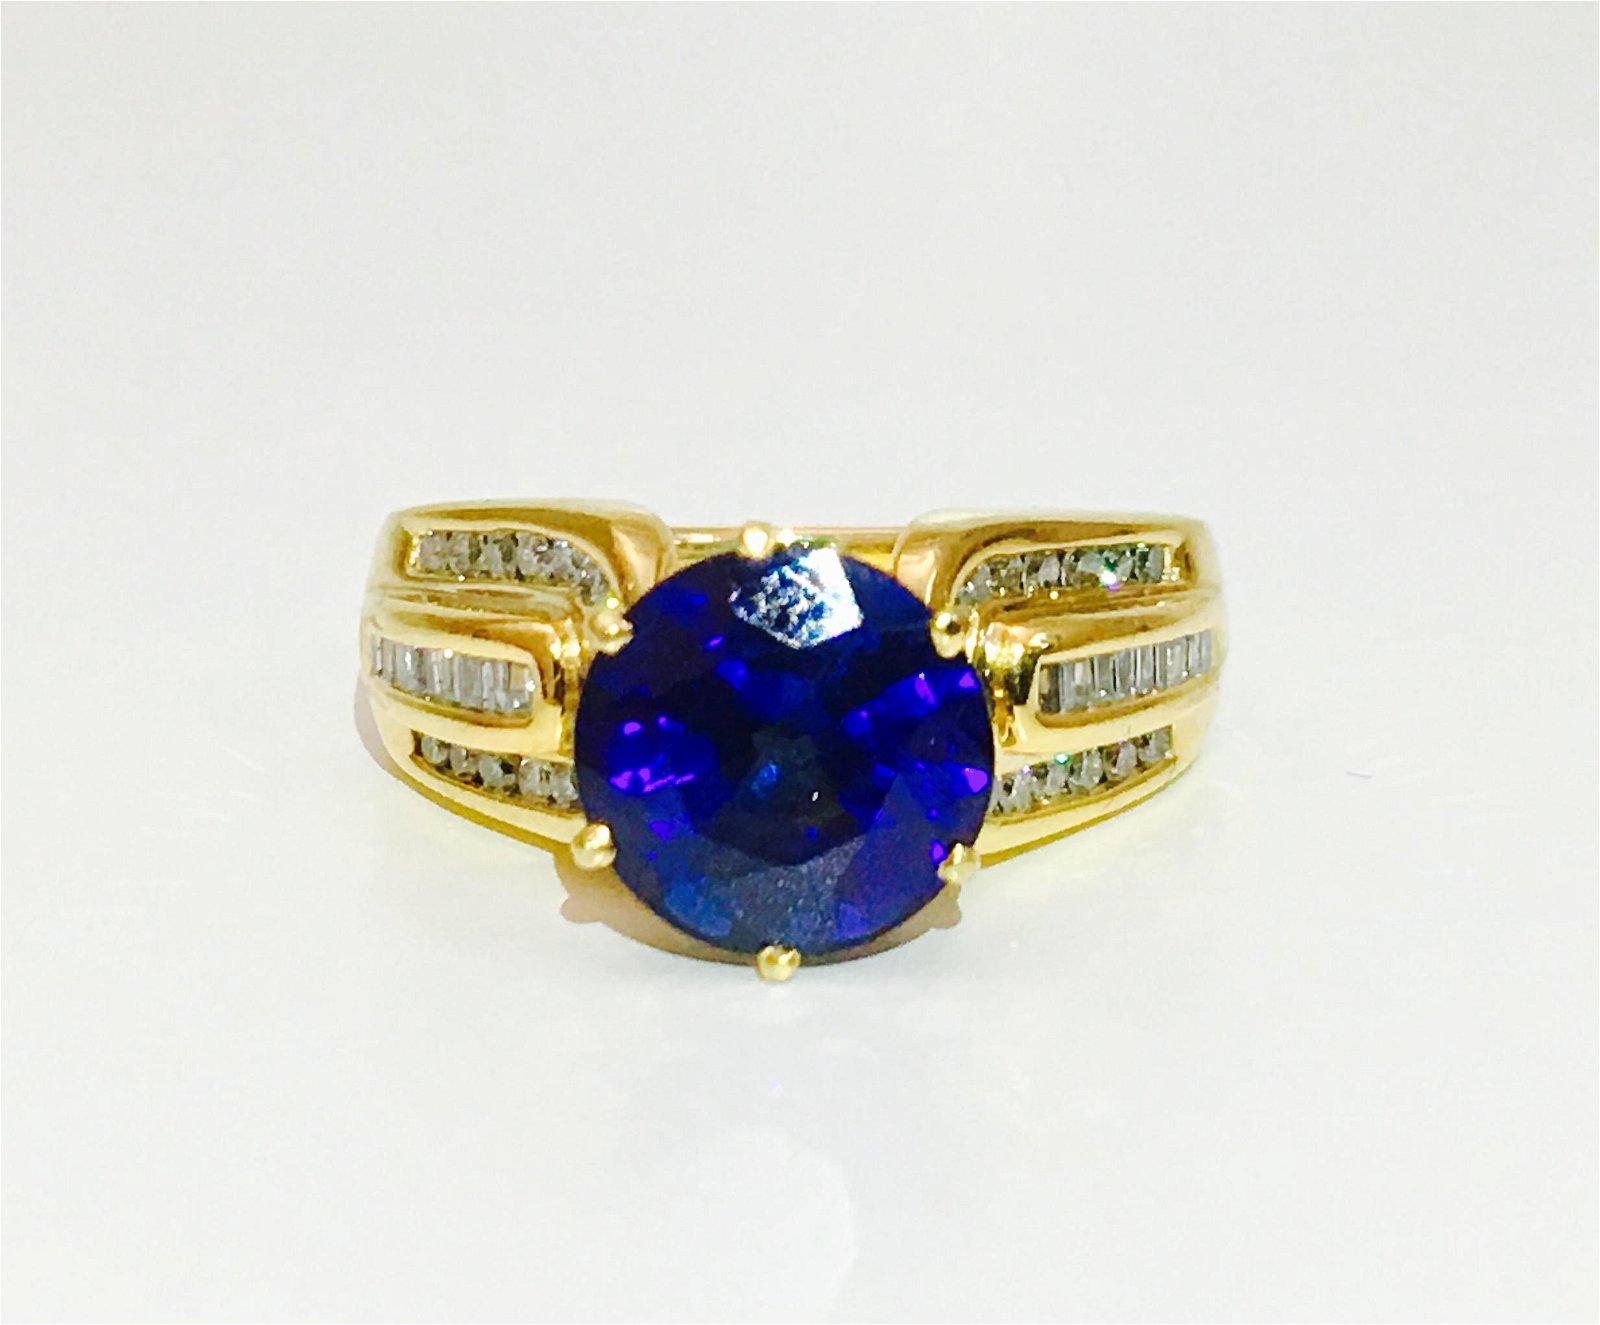 14K, Natural 7.00 ct Blue Sapphire & Diamond Ring